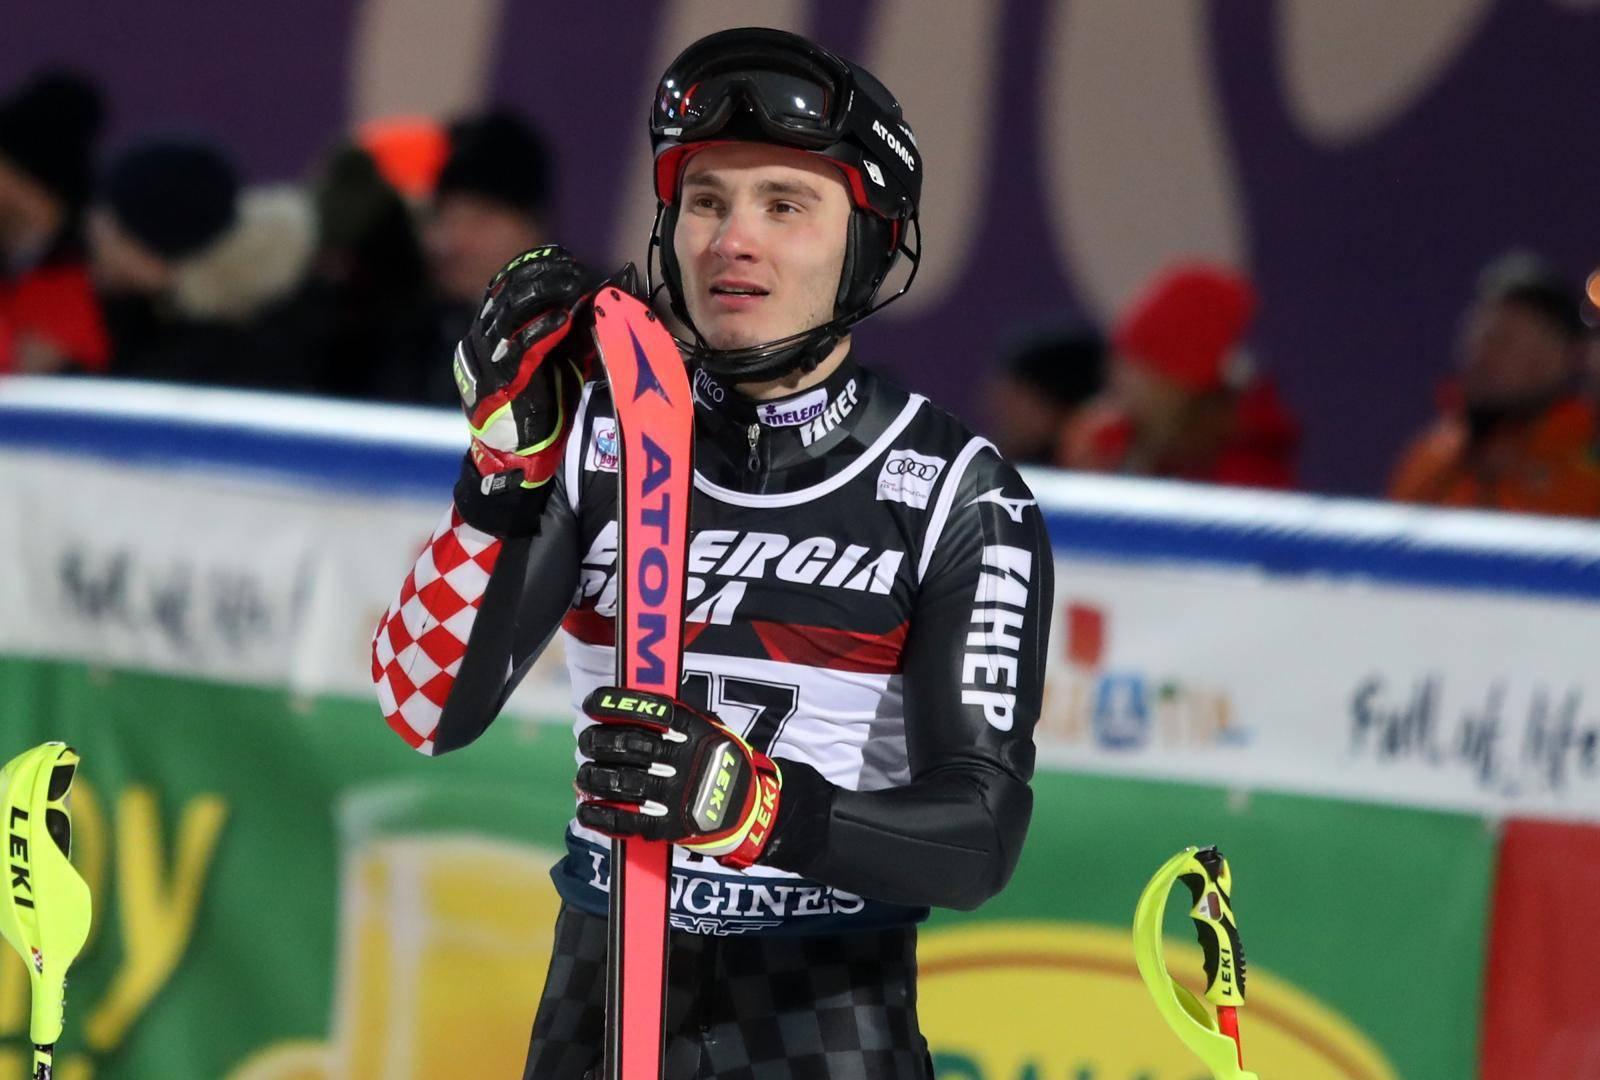 Zagreb: Druga vožnja muškog slaloma Audi FIS Svjetskog skijaškog kupa Snow Queen Trophy